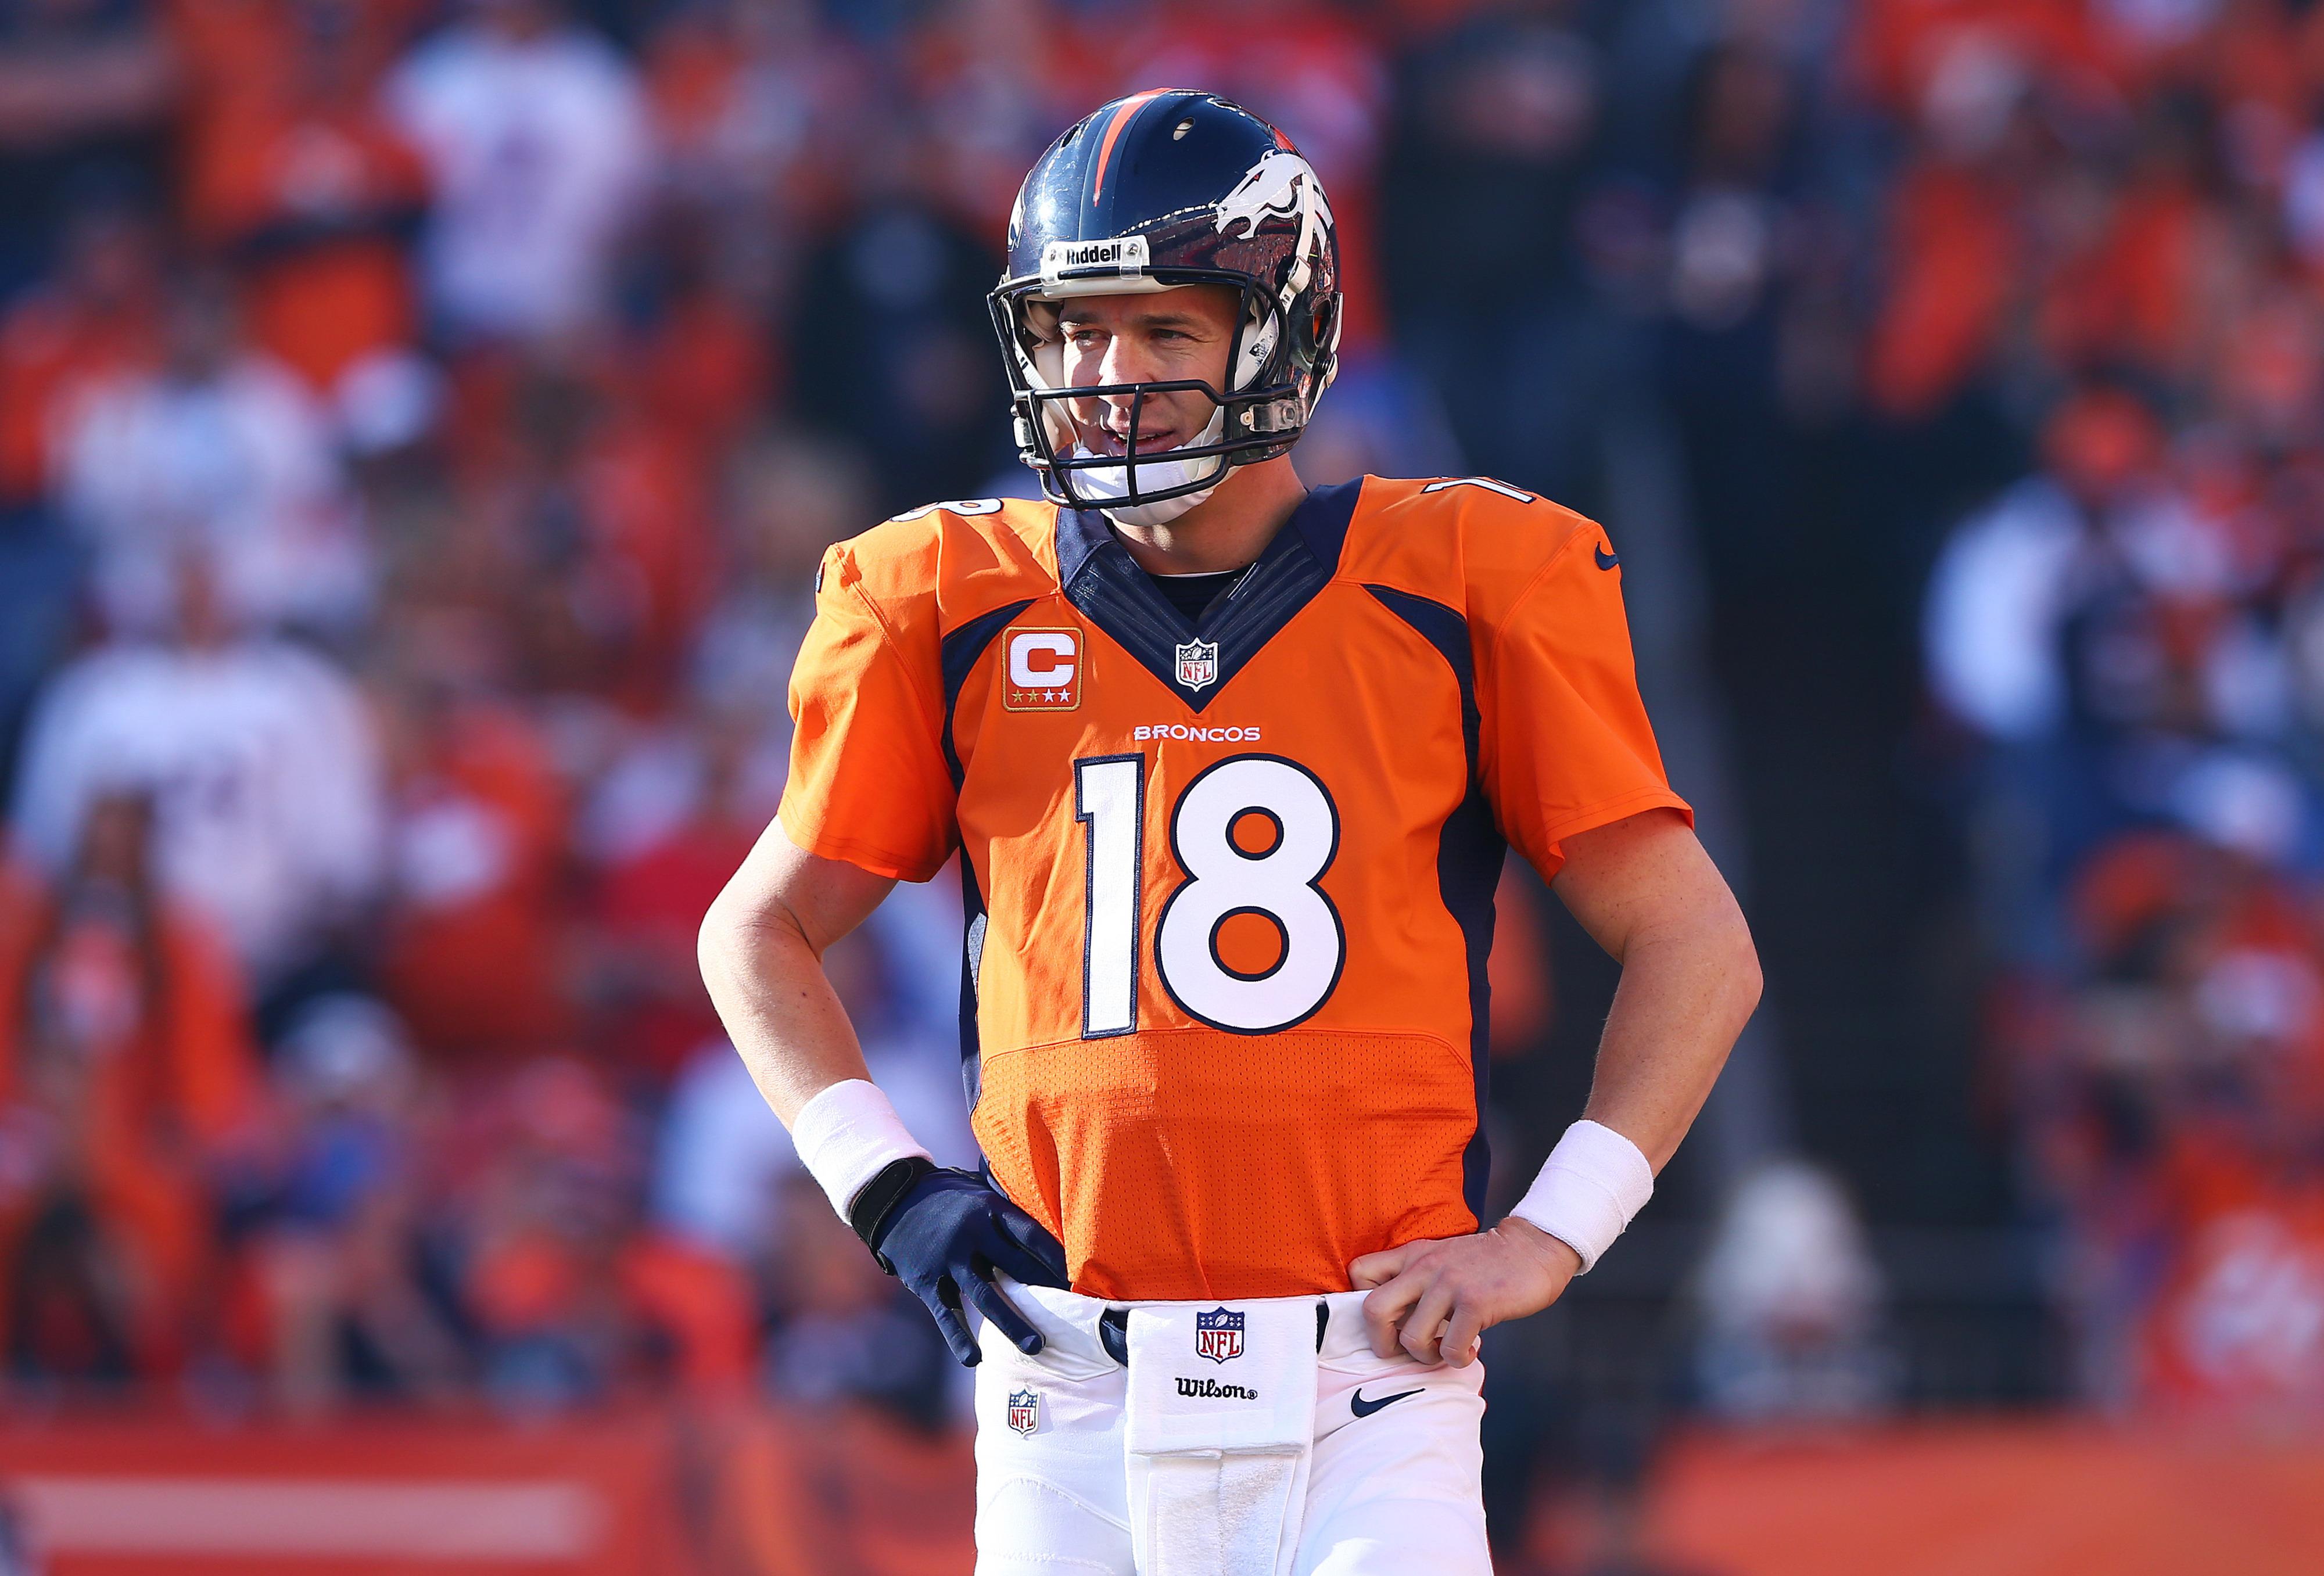 Super Bowl MVP odds: Peyton Manning is the betting favorite